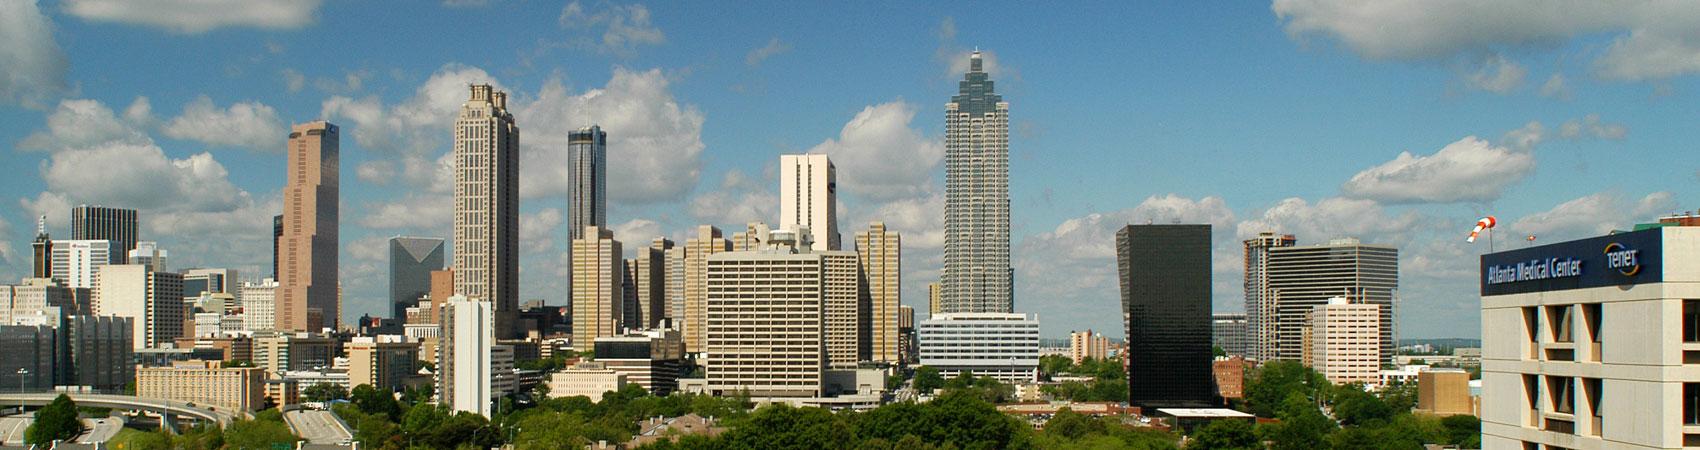 Atlanta-Skyline-1700x450